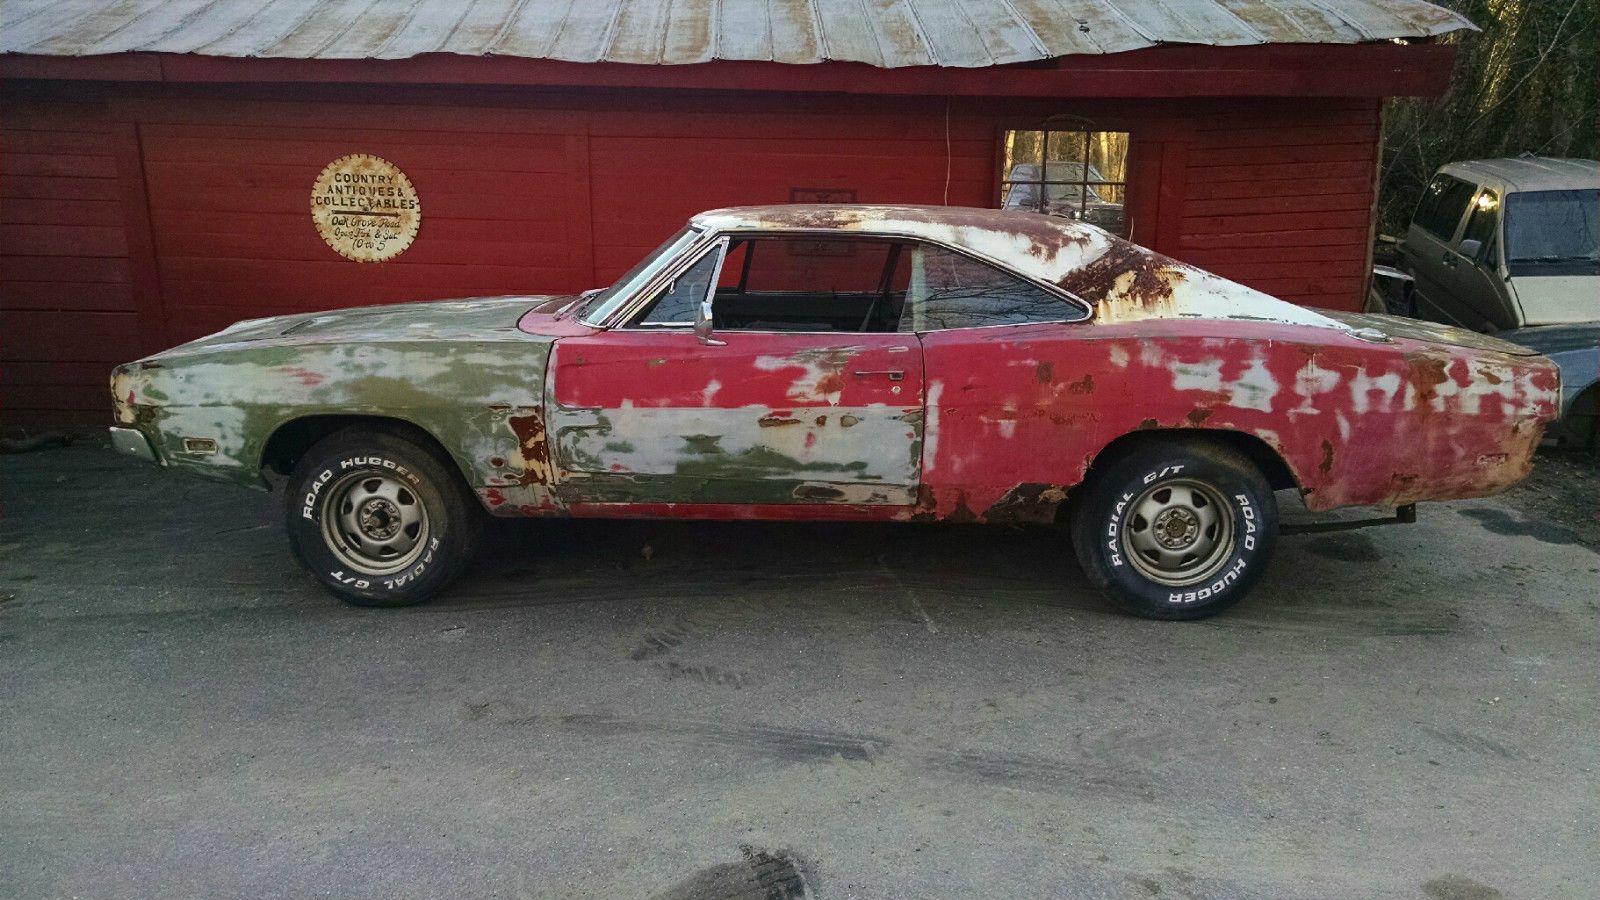 Dli 51 Cool Old Cars Barn Find Cars Junkyard Cars